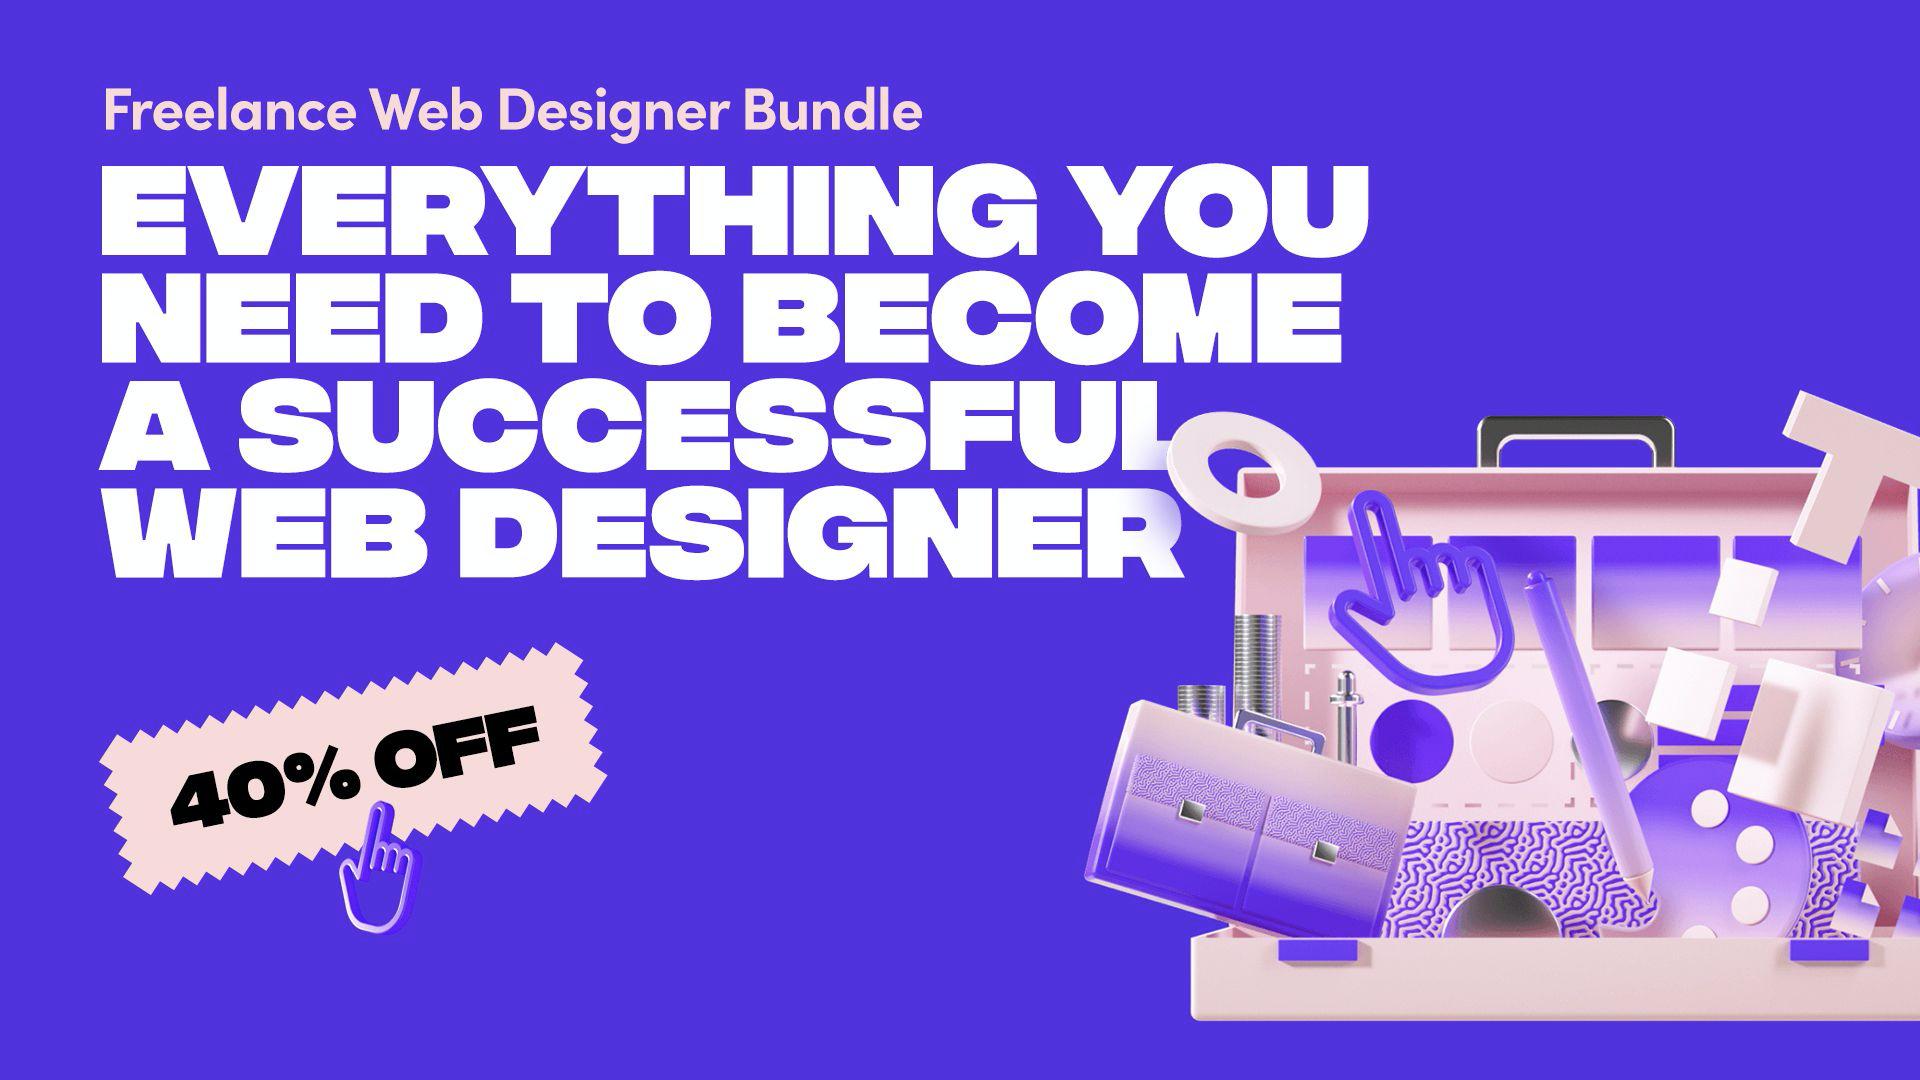 Save 40% on the freelance web designer bundle.